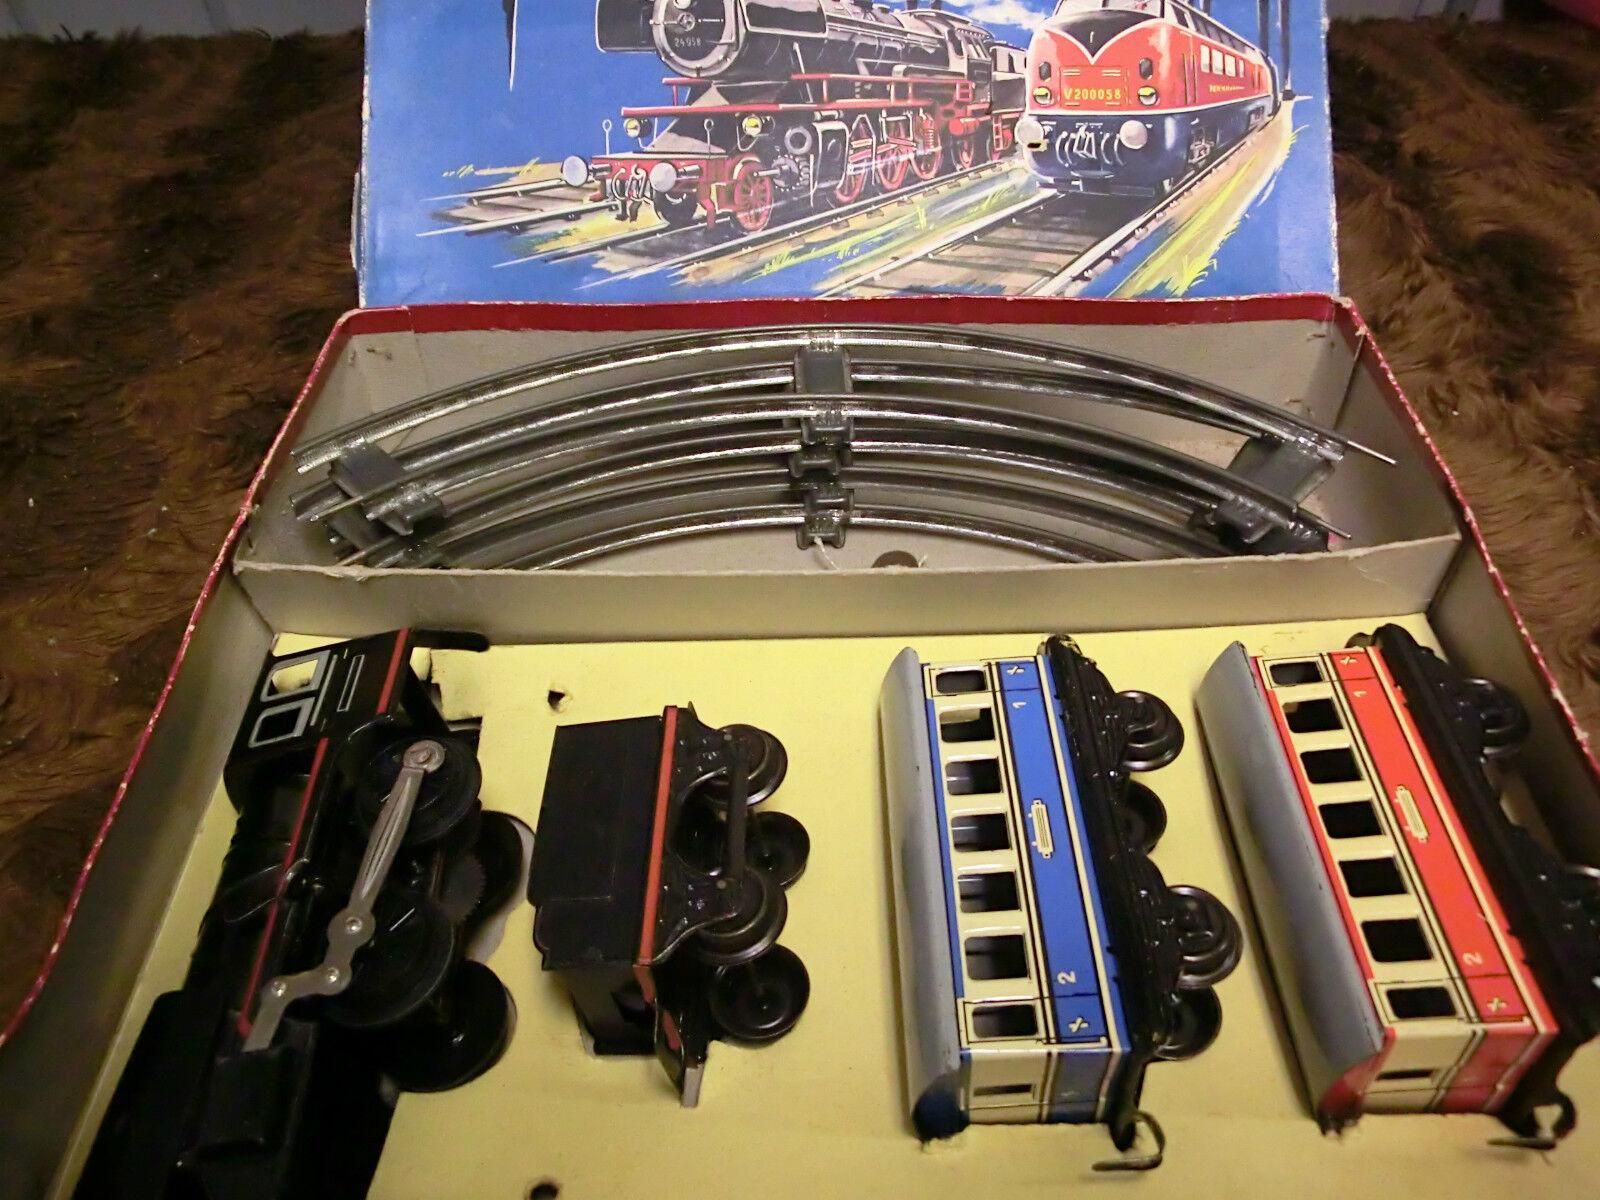 Distler Modeleisenbahn Blechspielzeug Dampflok m. Tender m. 2 Wagen